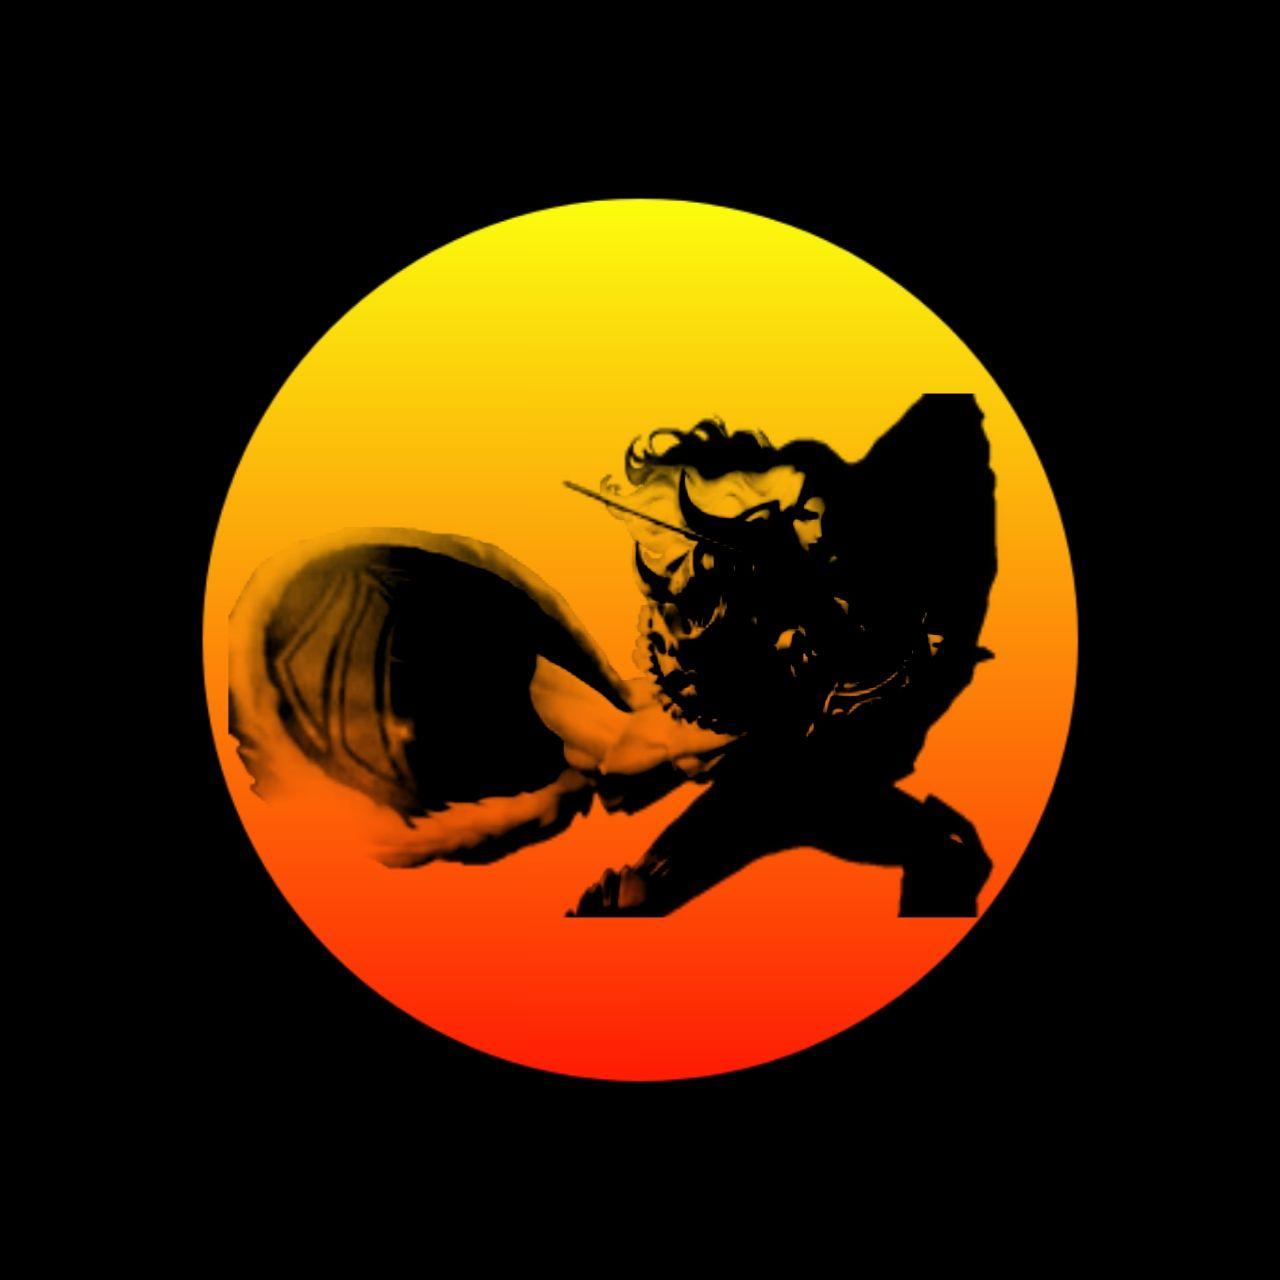 Insection Logo Lancelot Alucard Mobile Legends Mobile Legend Wallpaper Anime Wallpaper Live View and download masked knight lancelot mobile legends 4k ultra hd mobile wallpaper for free on your mobile phones, android phones and iphones. insection logo lancelot alucard